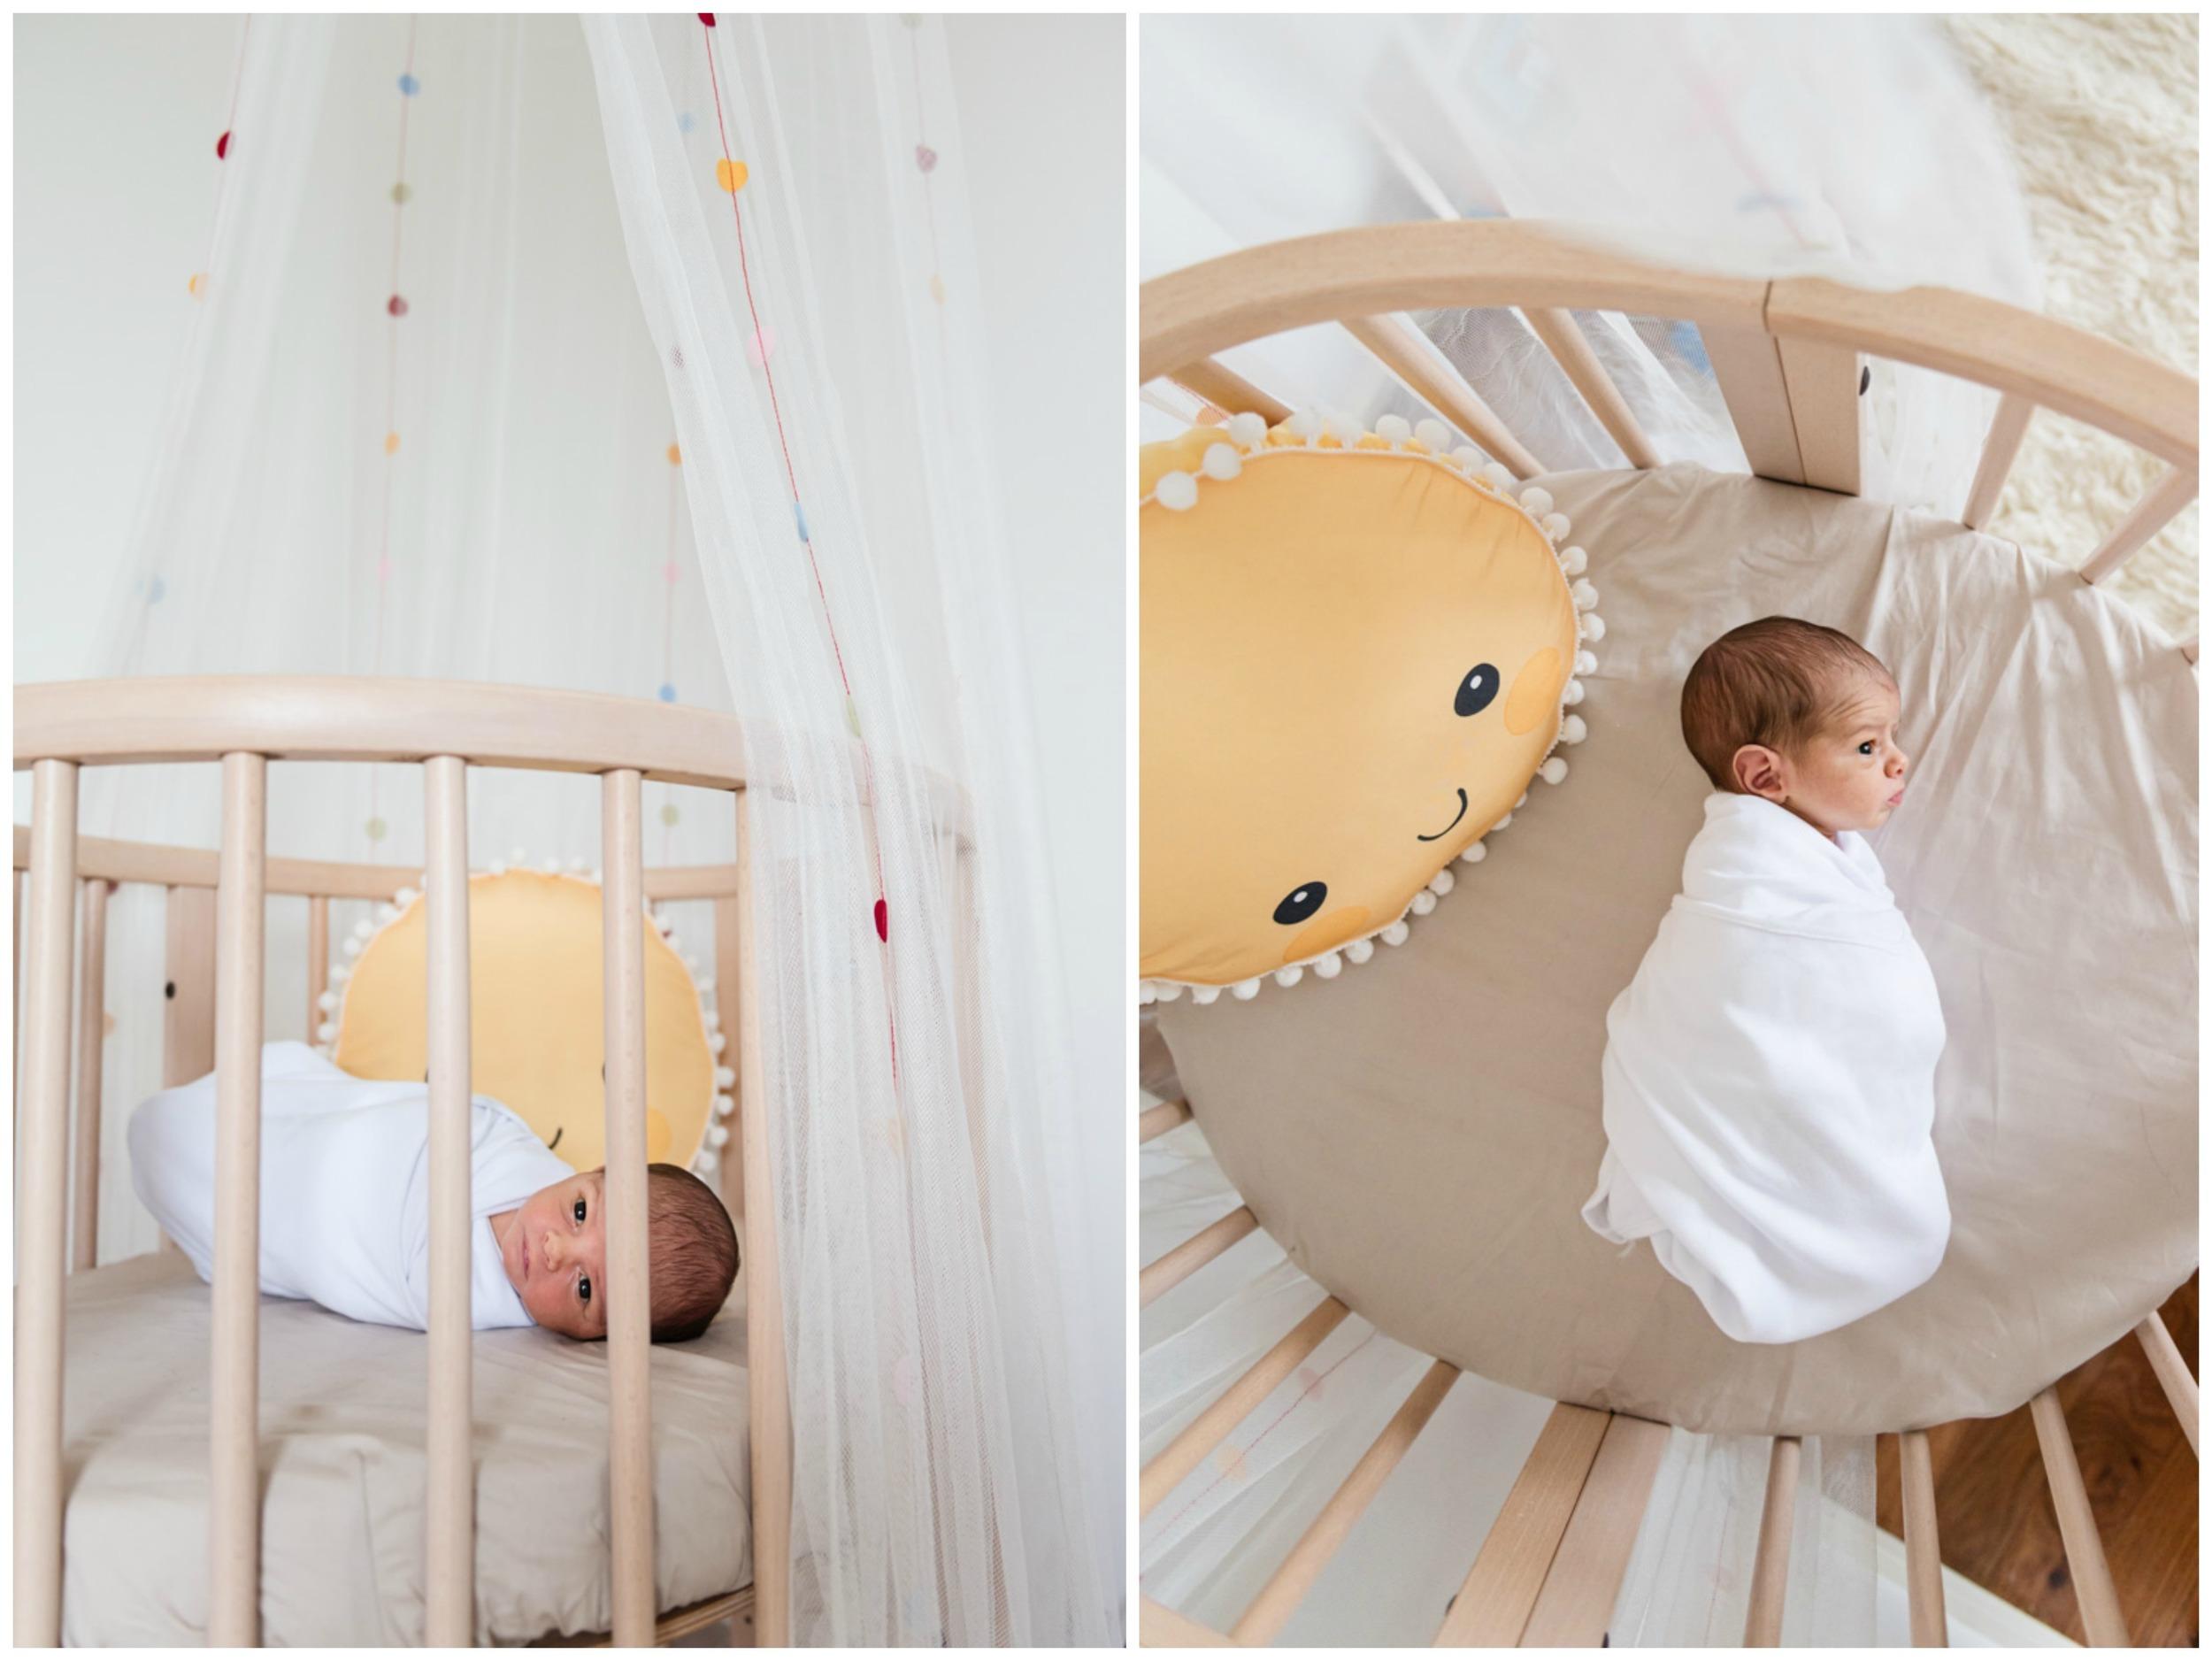 nathaniel | melbourne newborn photographer | clare kinsey photography